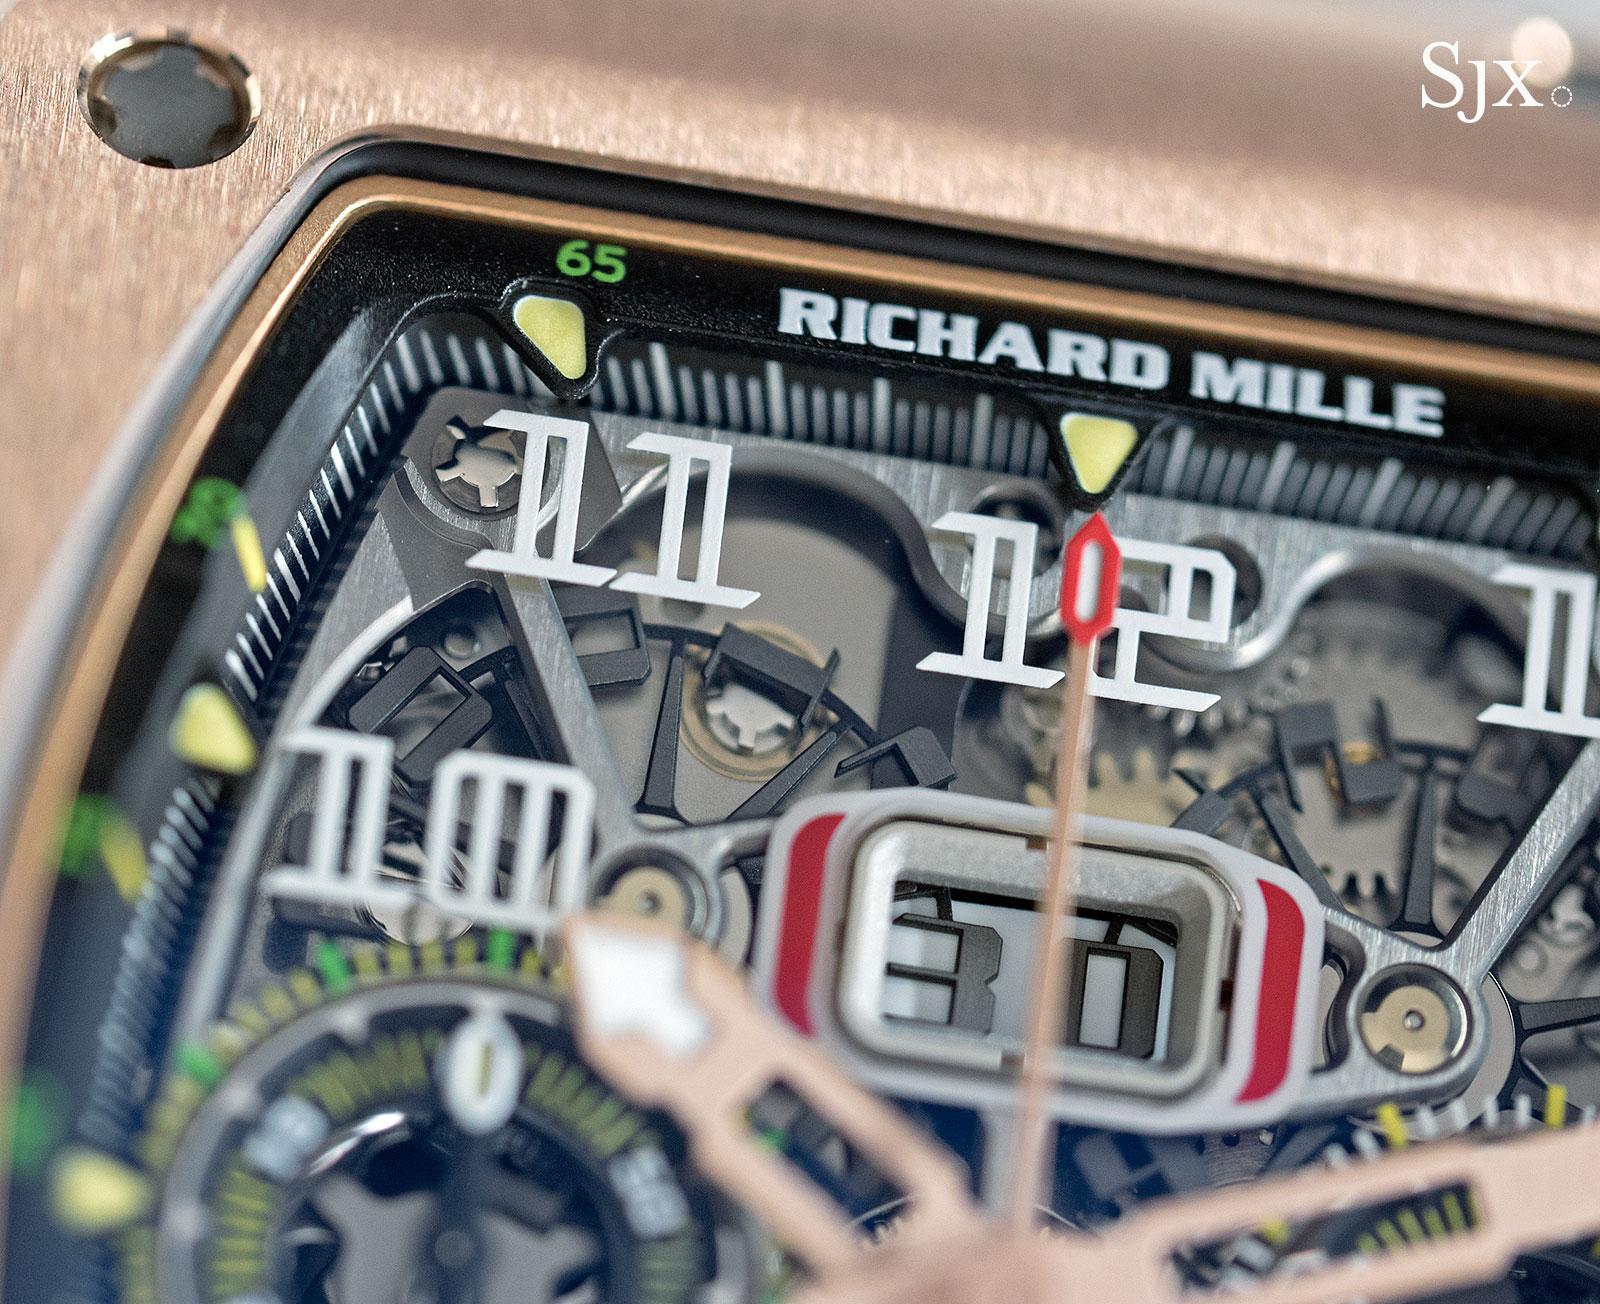 Richard Mille RM 11-03 RG-4